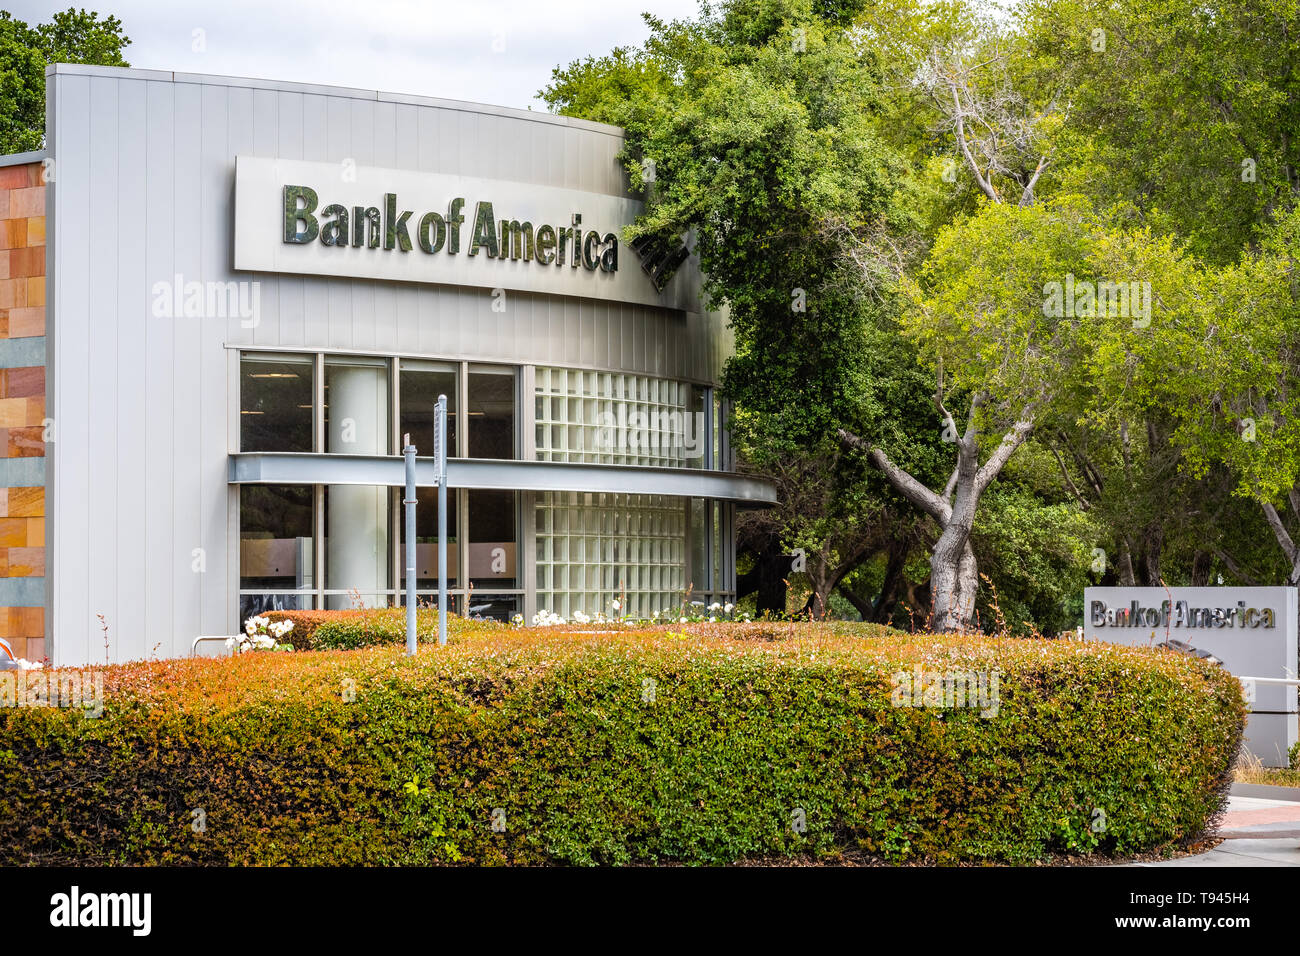 May 9, 2019 Palo Alto / CA / USA - Bank of America branch, San Francisco bay area - Stock Image